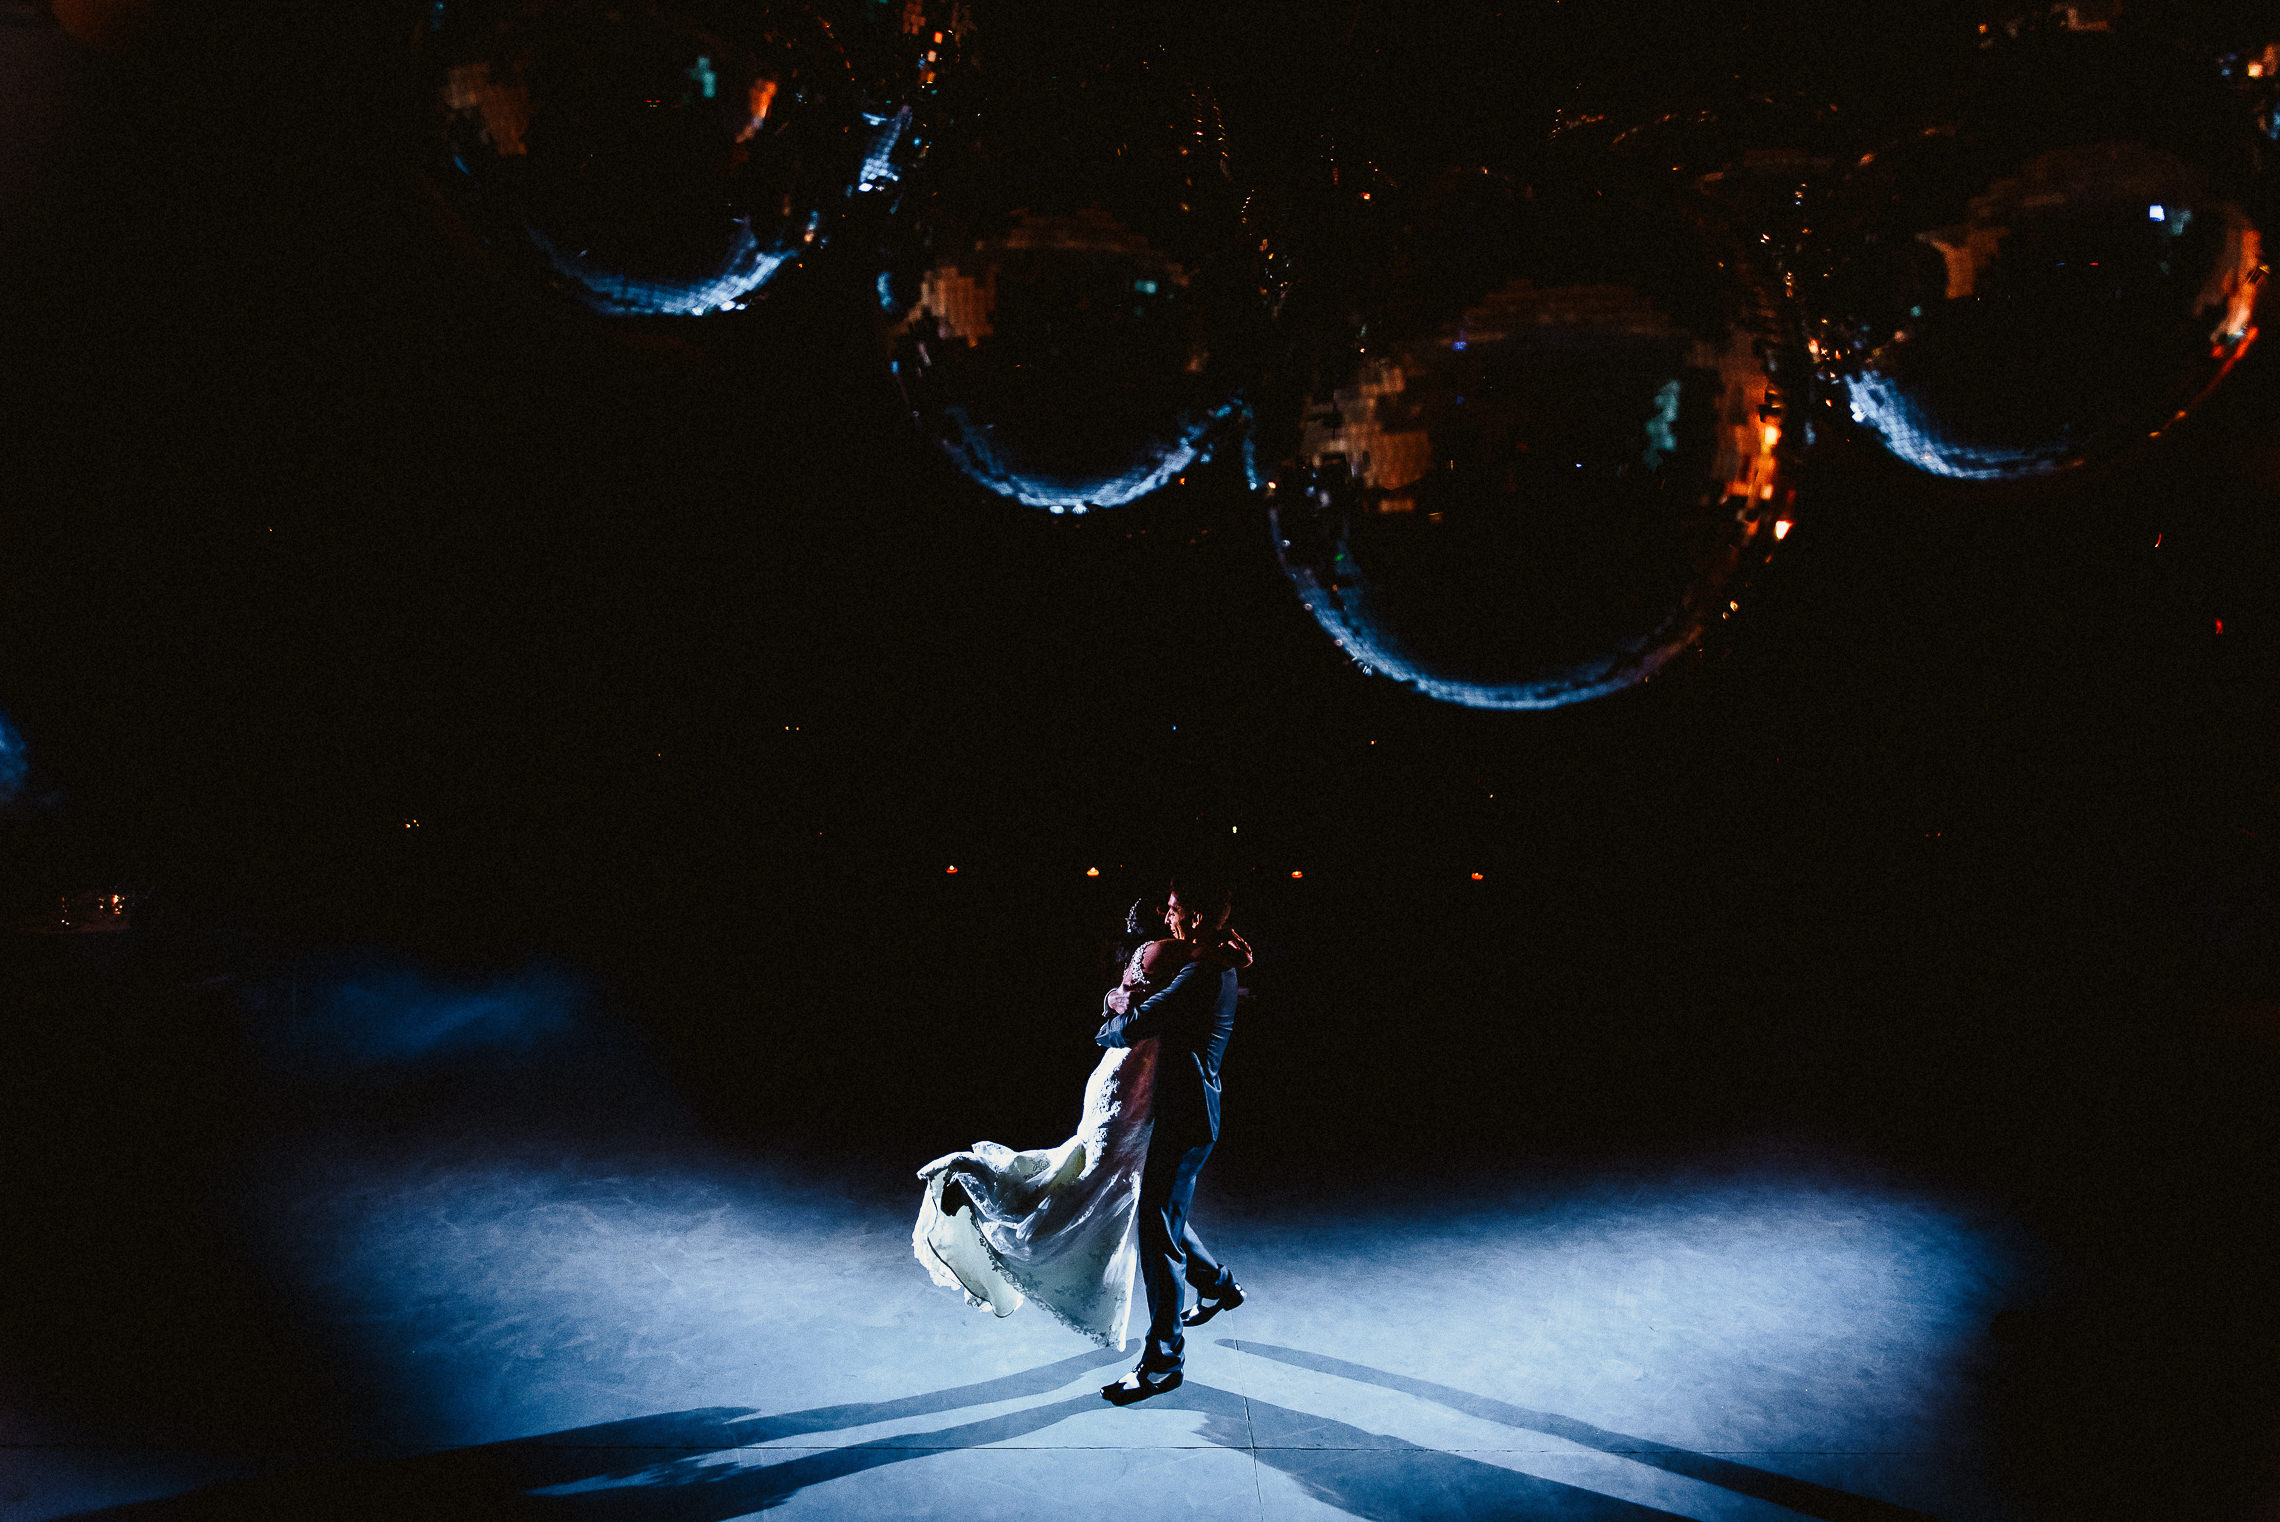 fotografo-matrimonios-chile-viña-del-mar-ceremonia-religiosa-hotel-sheraton-fotografia-de-bodas-deborah-dantzofffotografo-matrimonios-chile-viña-del-mar-ceremonia-religiosa-hotel-sheraton-fotografia-de-bodas-deborah-dantzoff